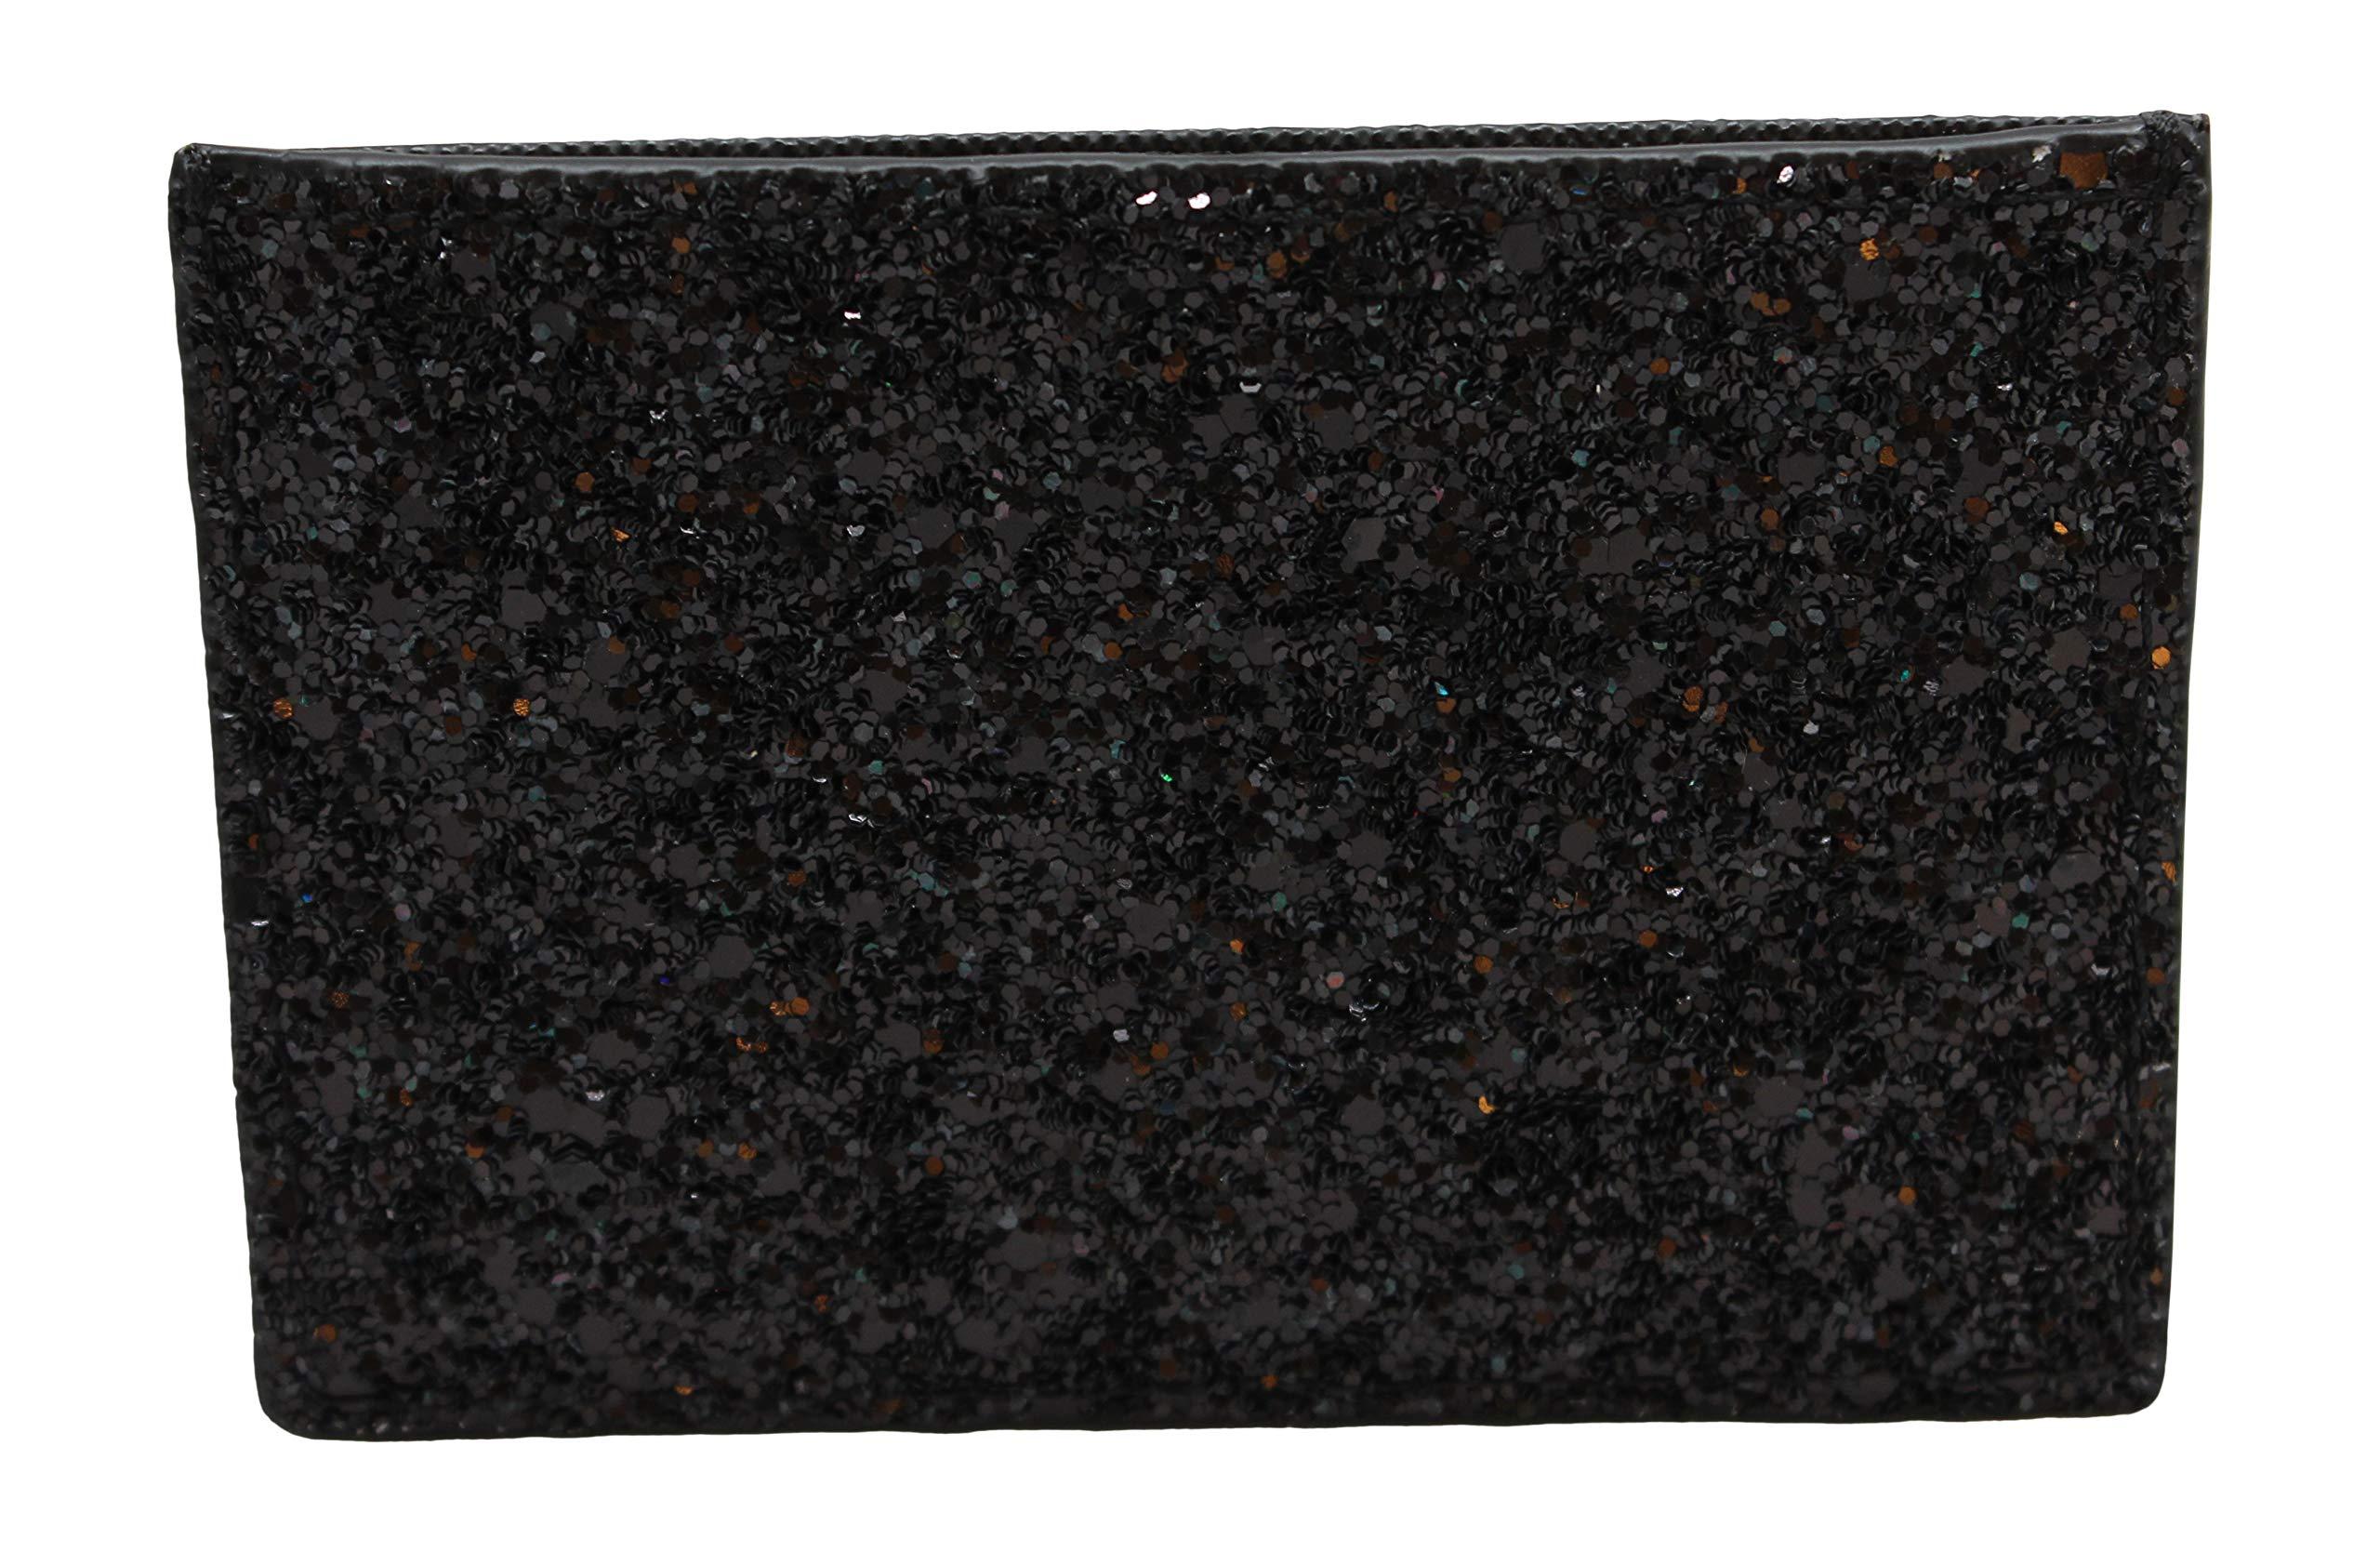 Kate Spade New York Graham Greta Court Wallet Business Credit Card Case Glitter Black by Kate Spade New York